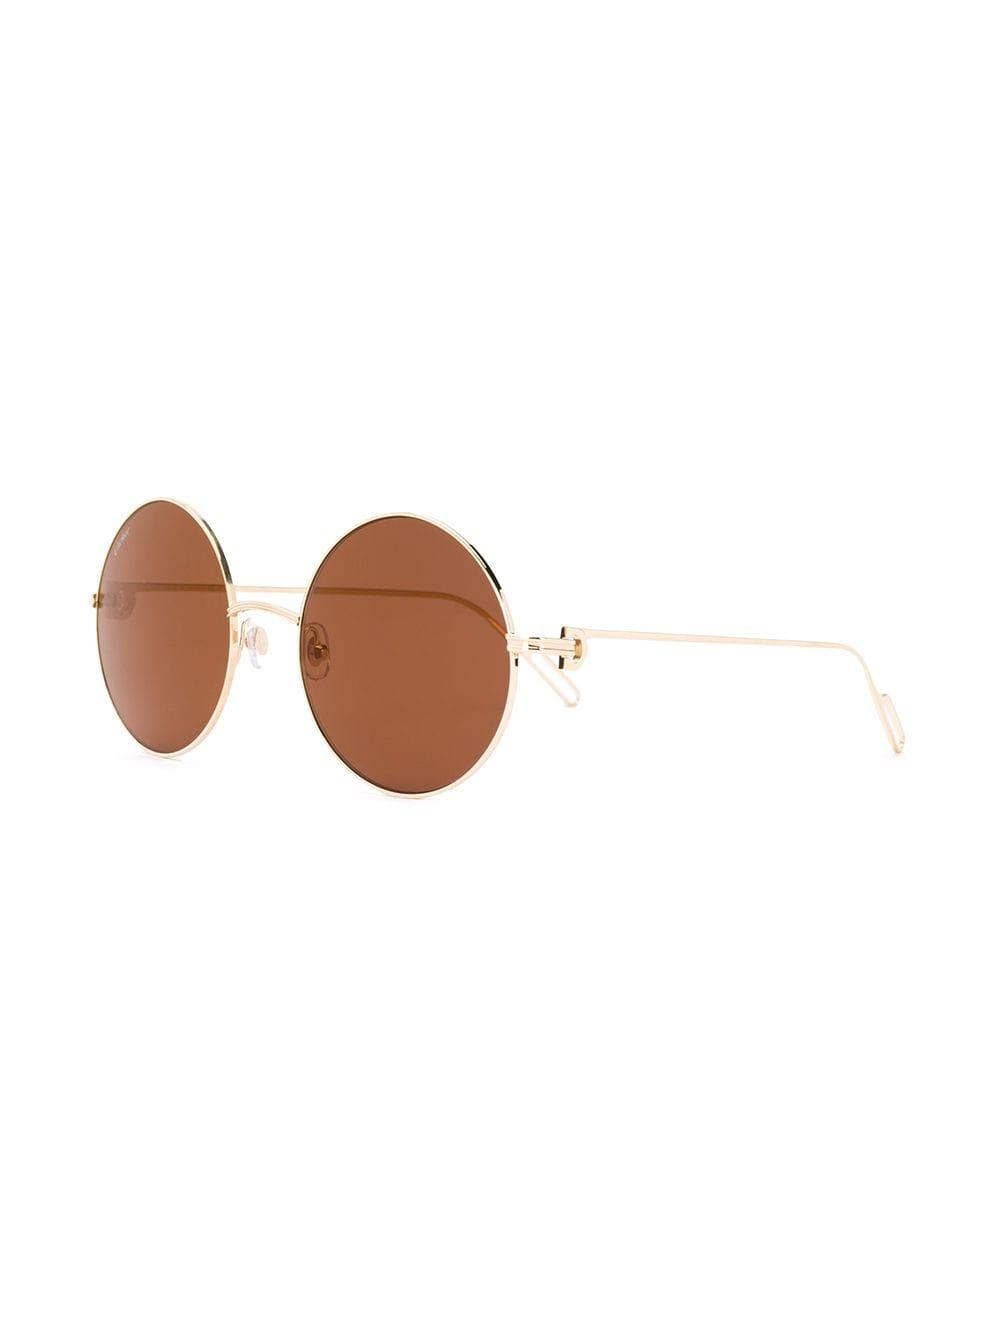 e9e91759fc Cartier - Metallic Round Frame Sunglasses - Lyst. View fullscreen